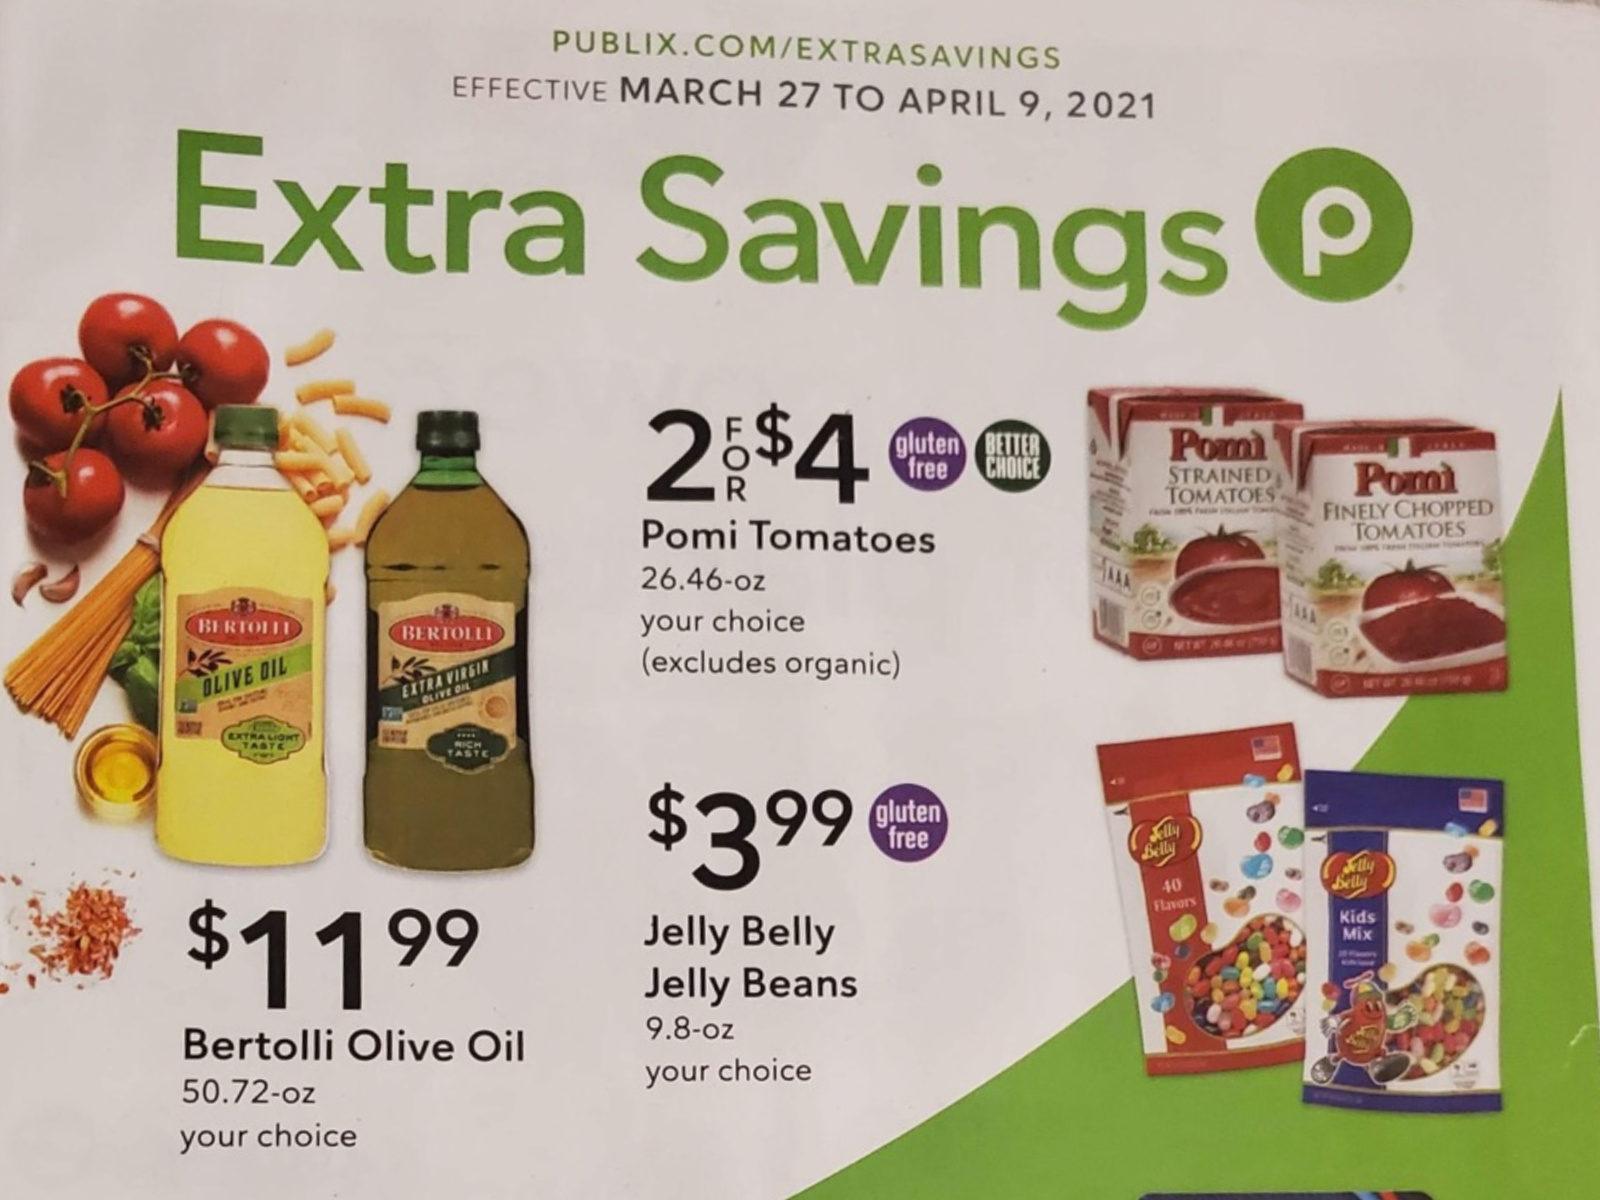 Publix Extra Savings Flyer Valid 3/27 to 4/9 on I Heart Publix